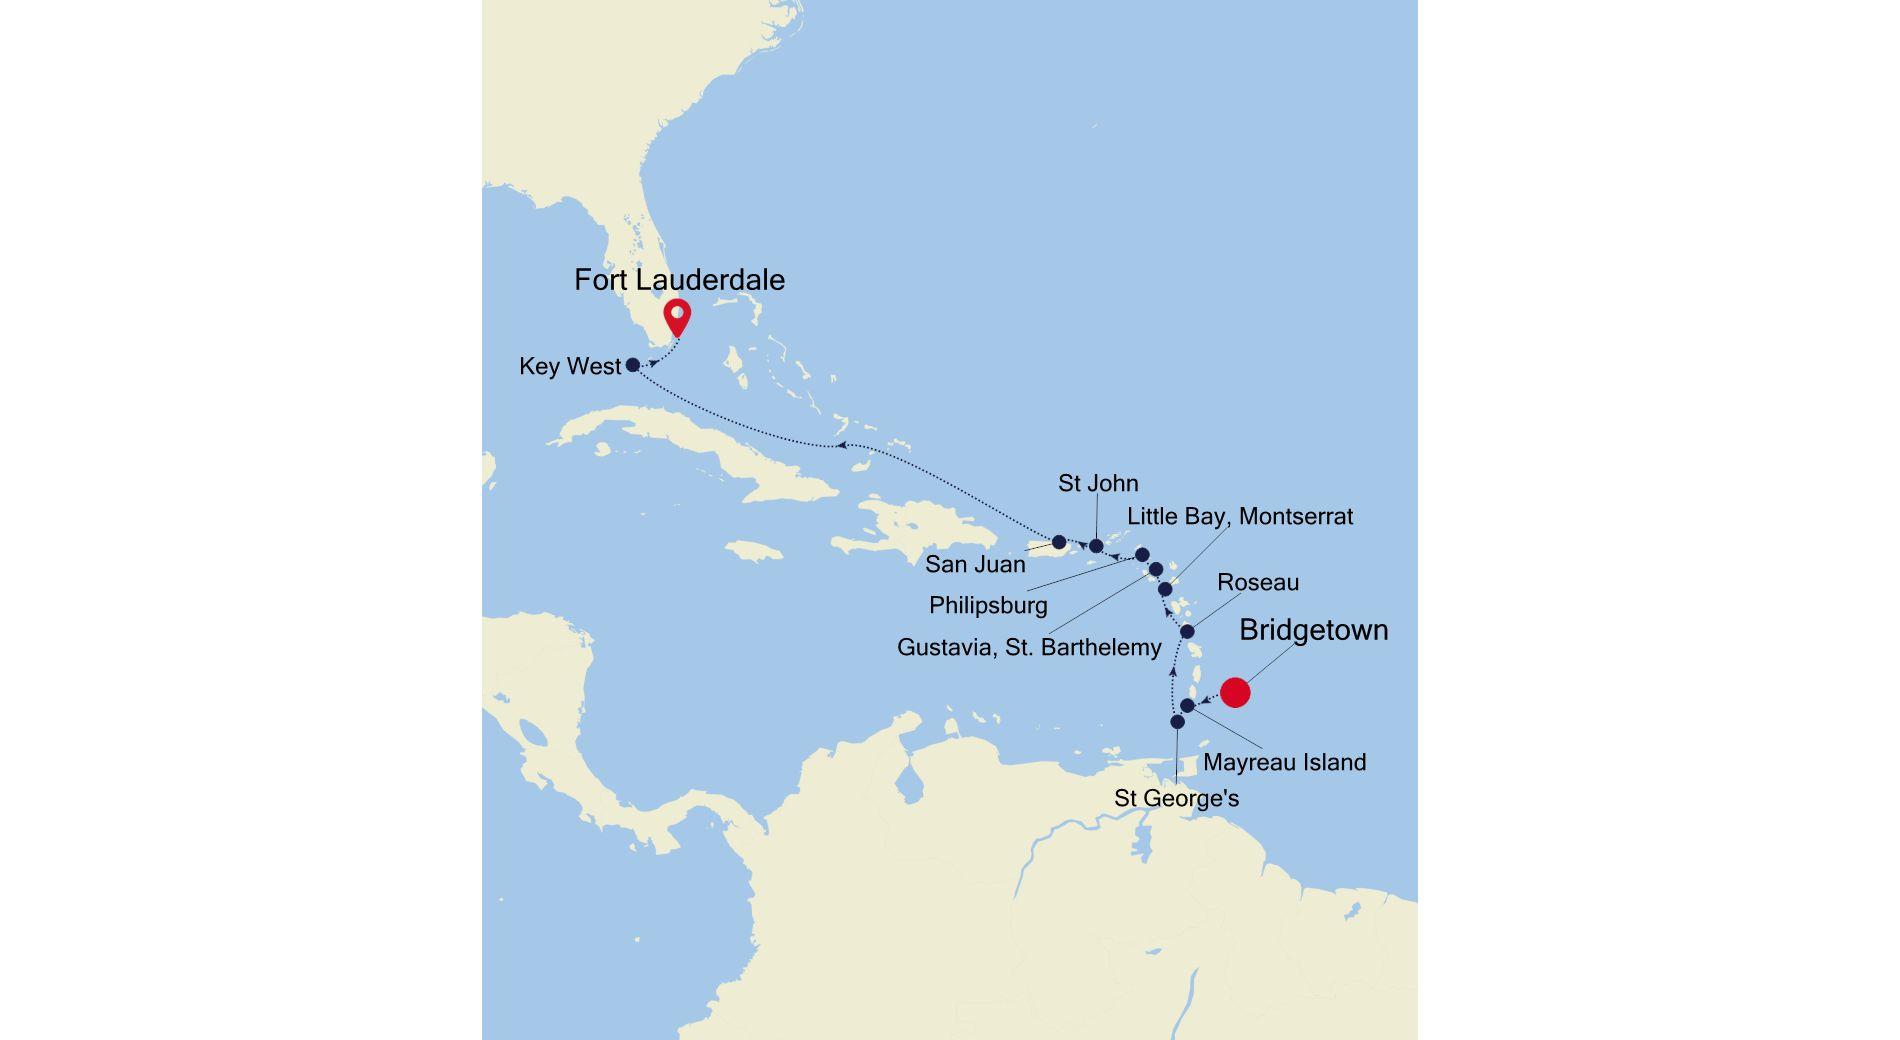 WH211120012 - Bridgetown to Fort Lauderdale